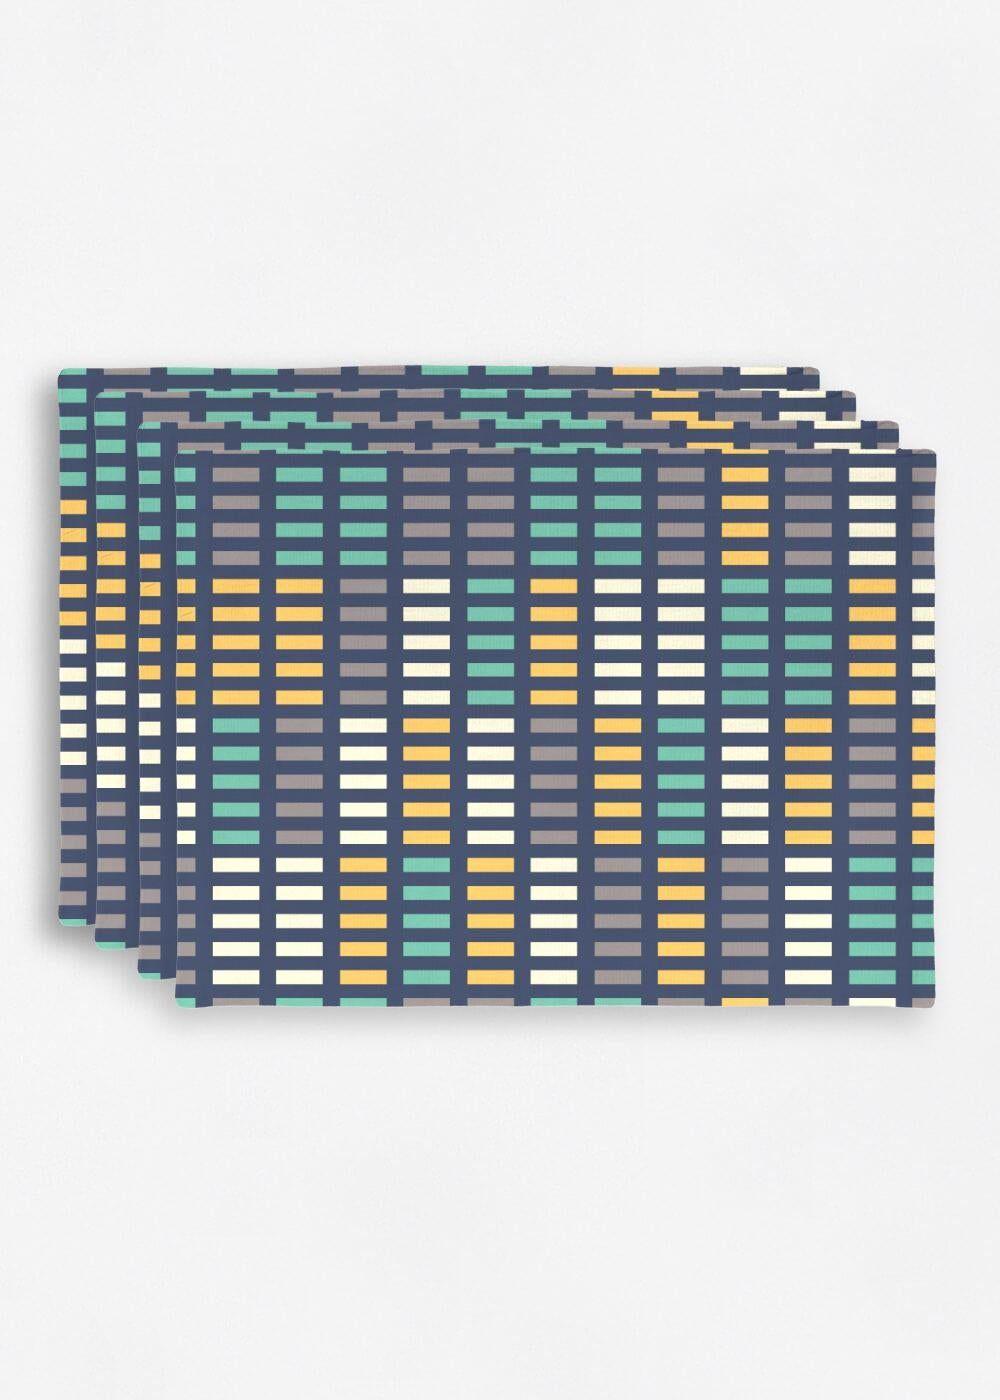 VIDA Placemat Set - Music Equalizer by VIDA Original Artist  - Size: Set of 4